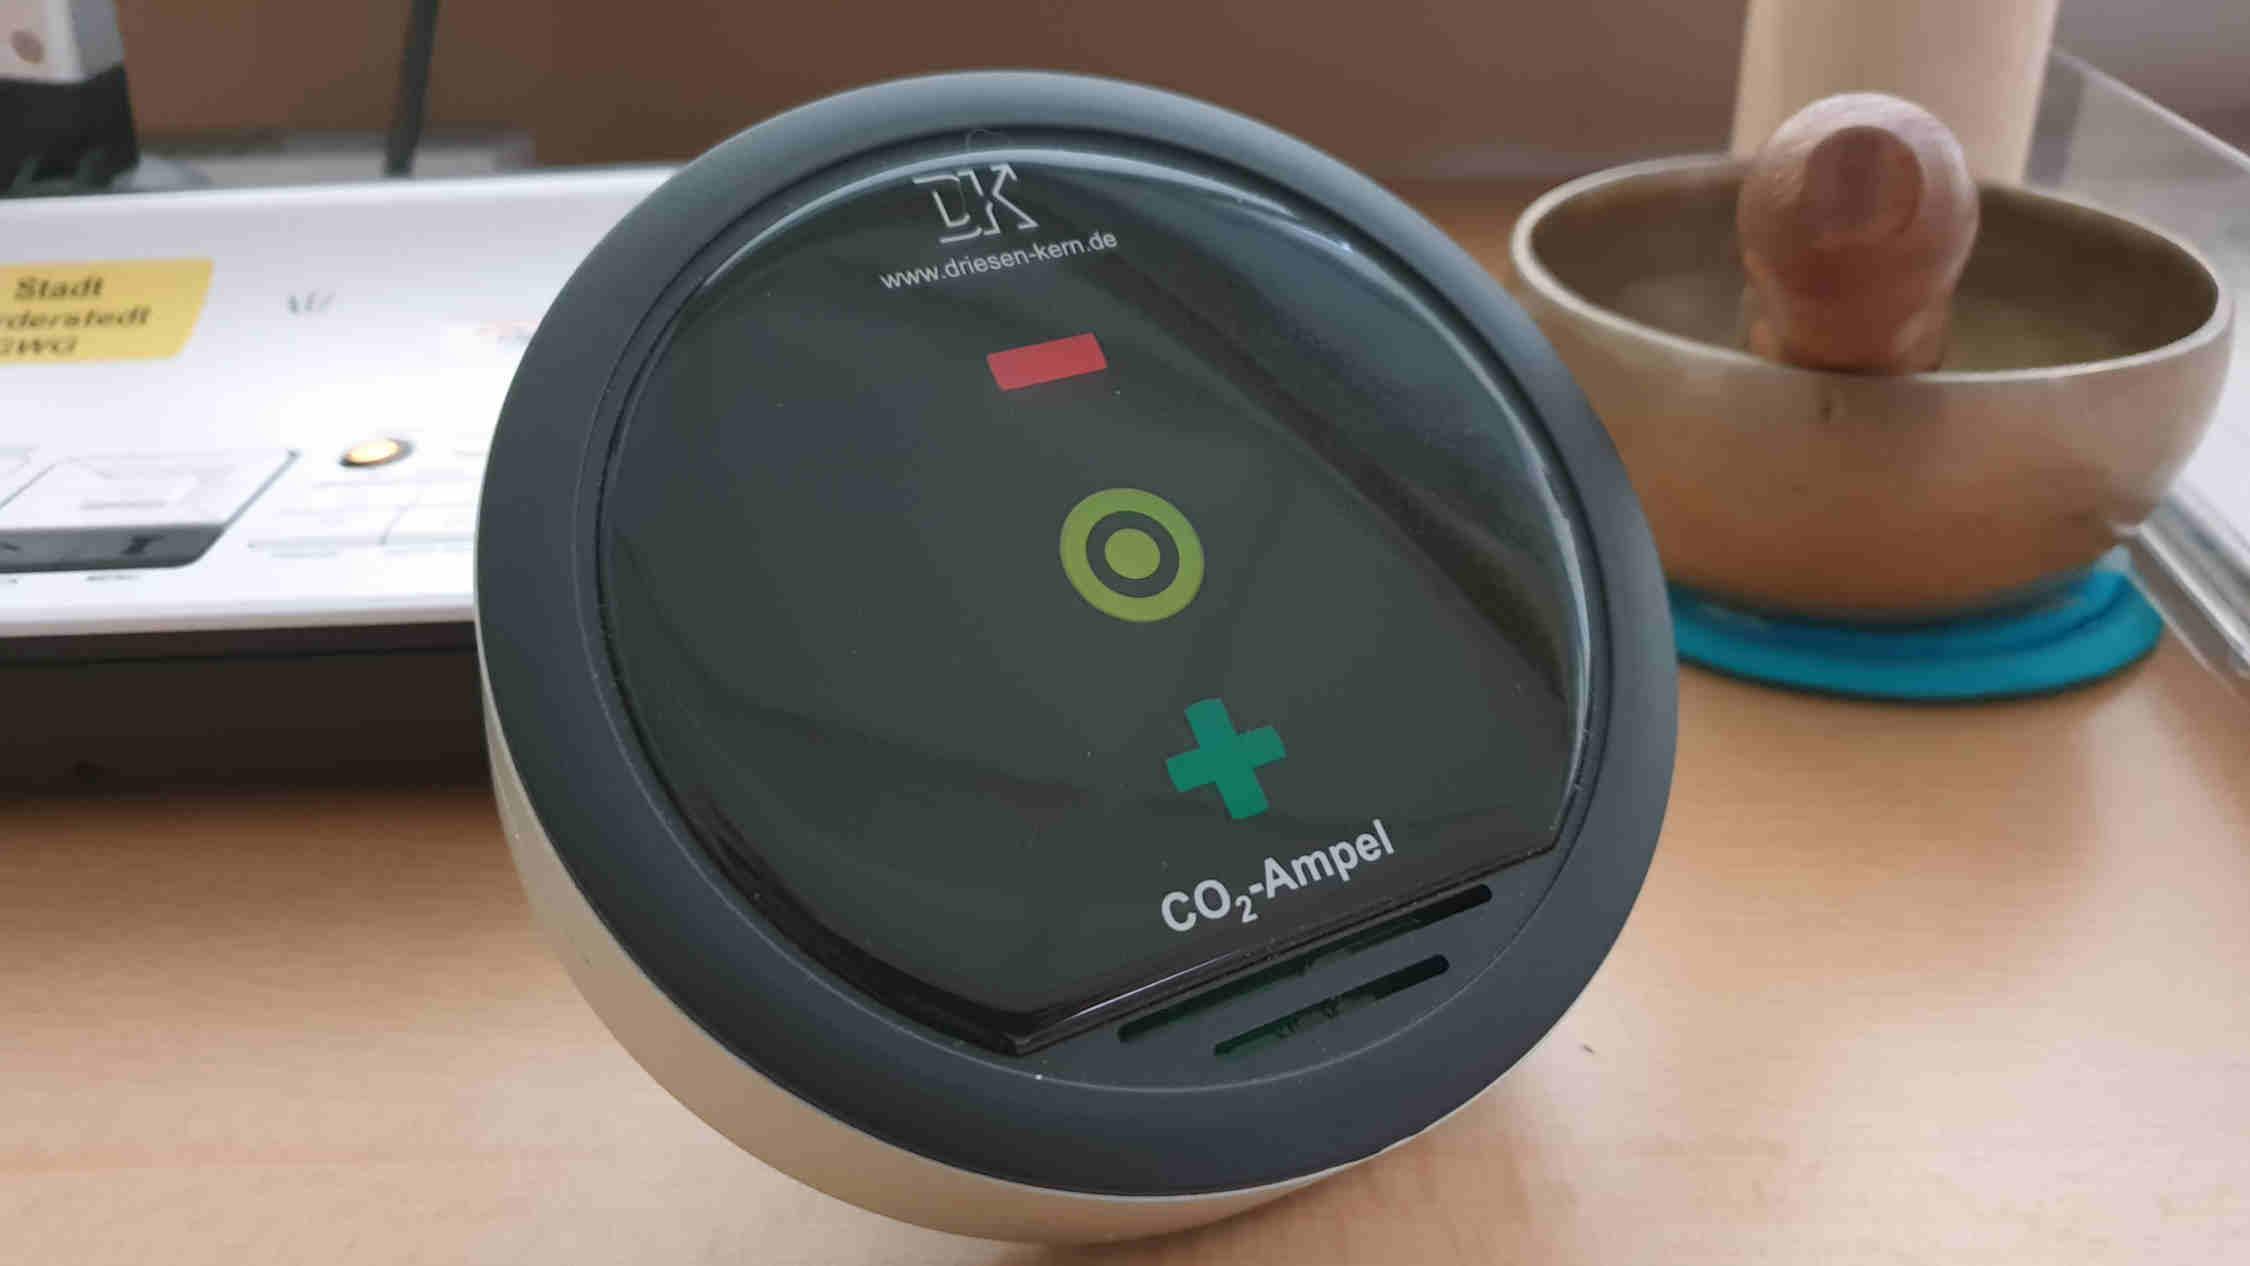 CO2 – Geräte in allen Klassen Hilfe beim Lüften